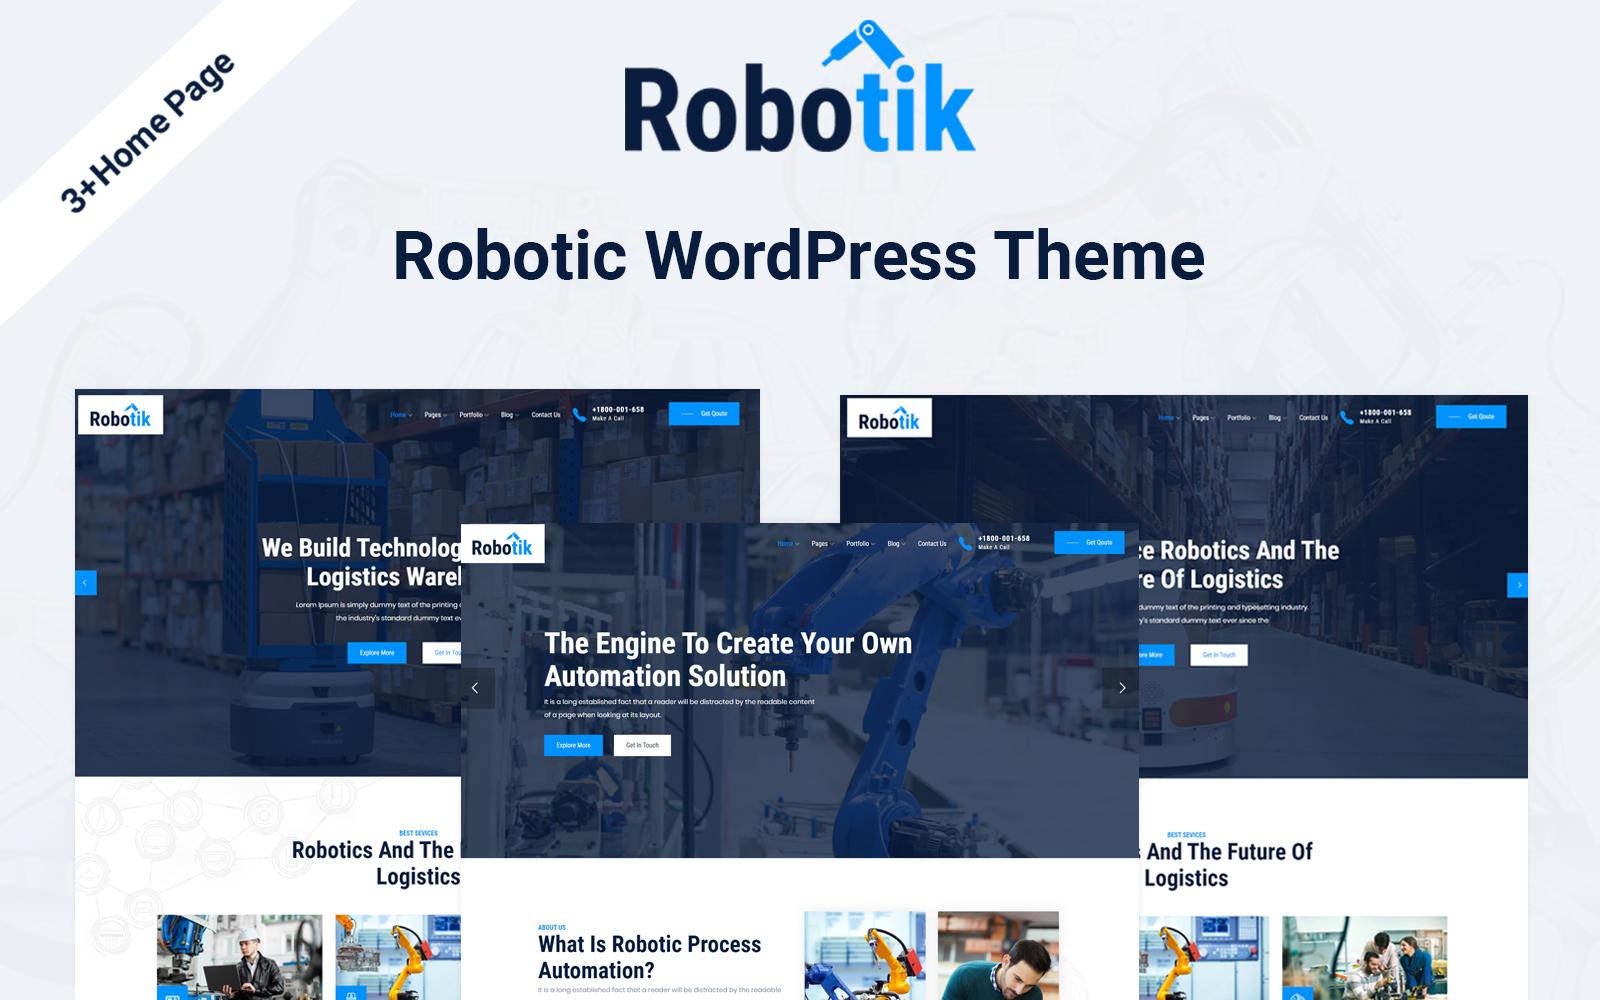 Robotik - Robotic Automation Tema WordPress №125685